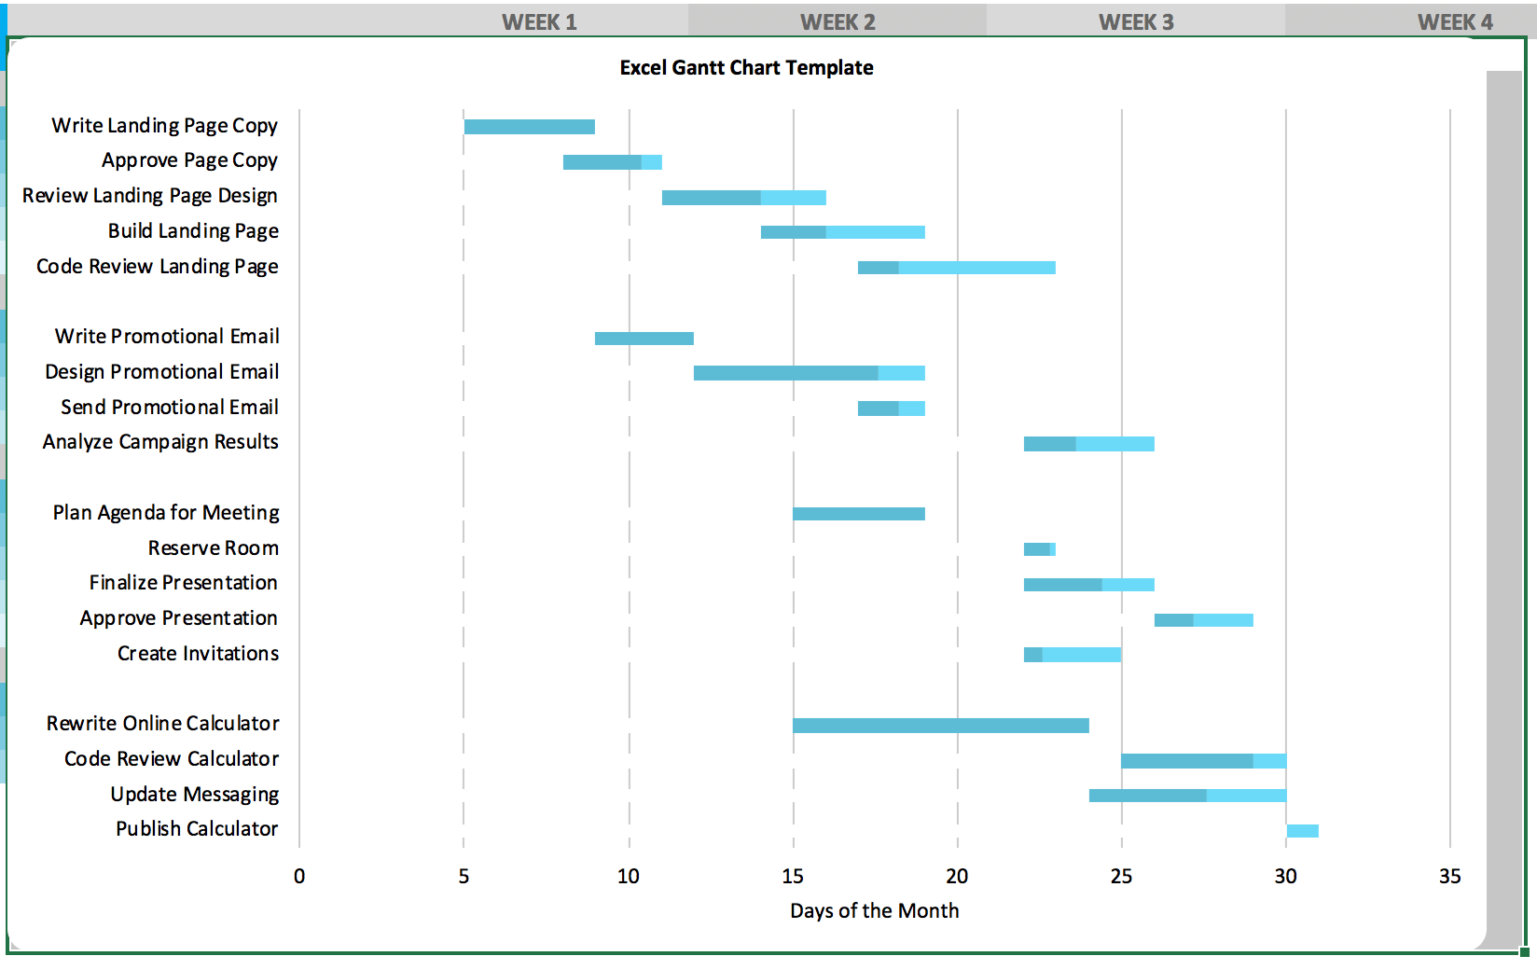 Free Gantt Chart Excel Template: Download Now   Teamgantt Throughout Excel Spreadsheet Gantt Chart Template